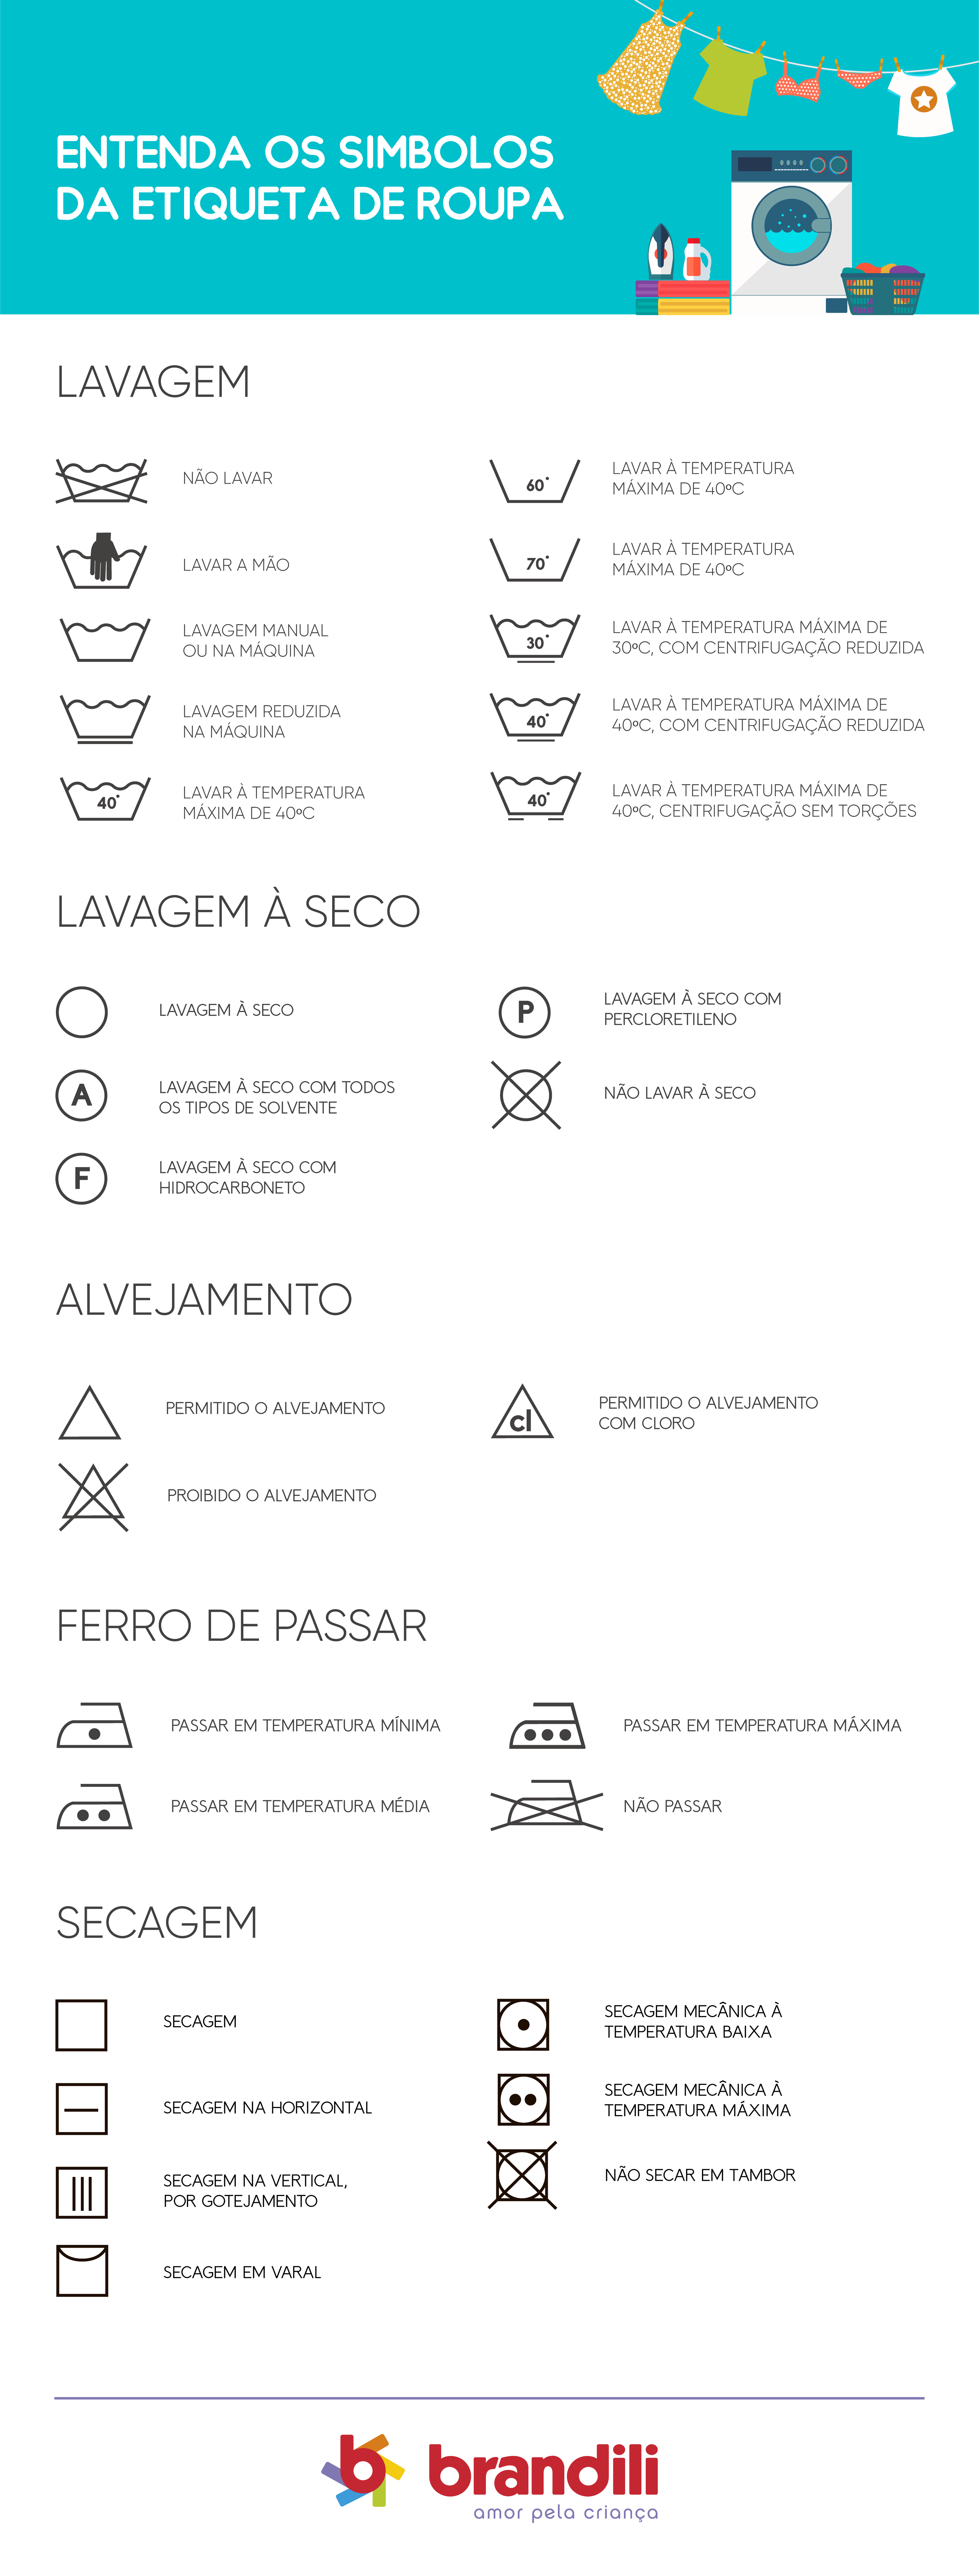 Entenda os símbolos da etiqueta das roupas